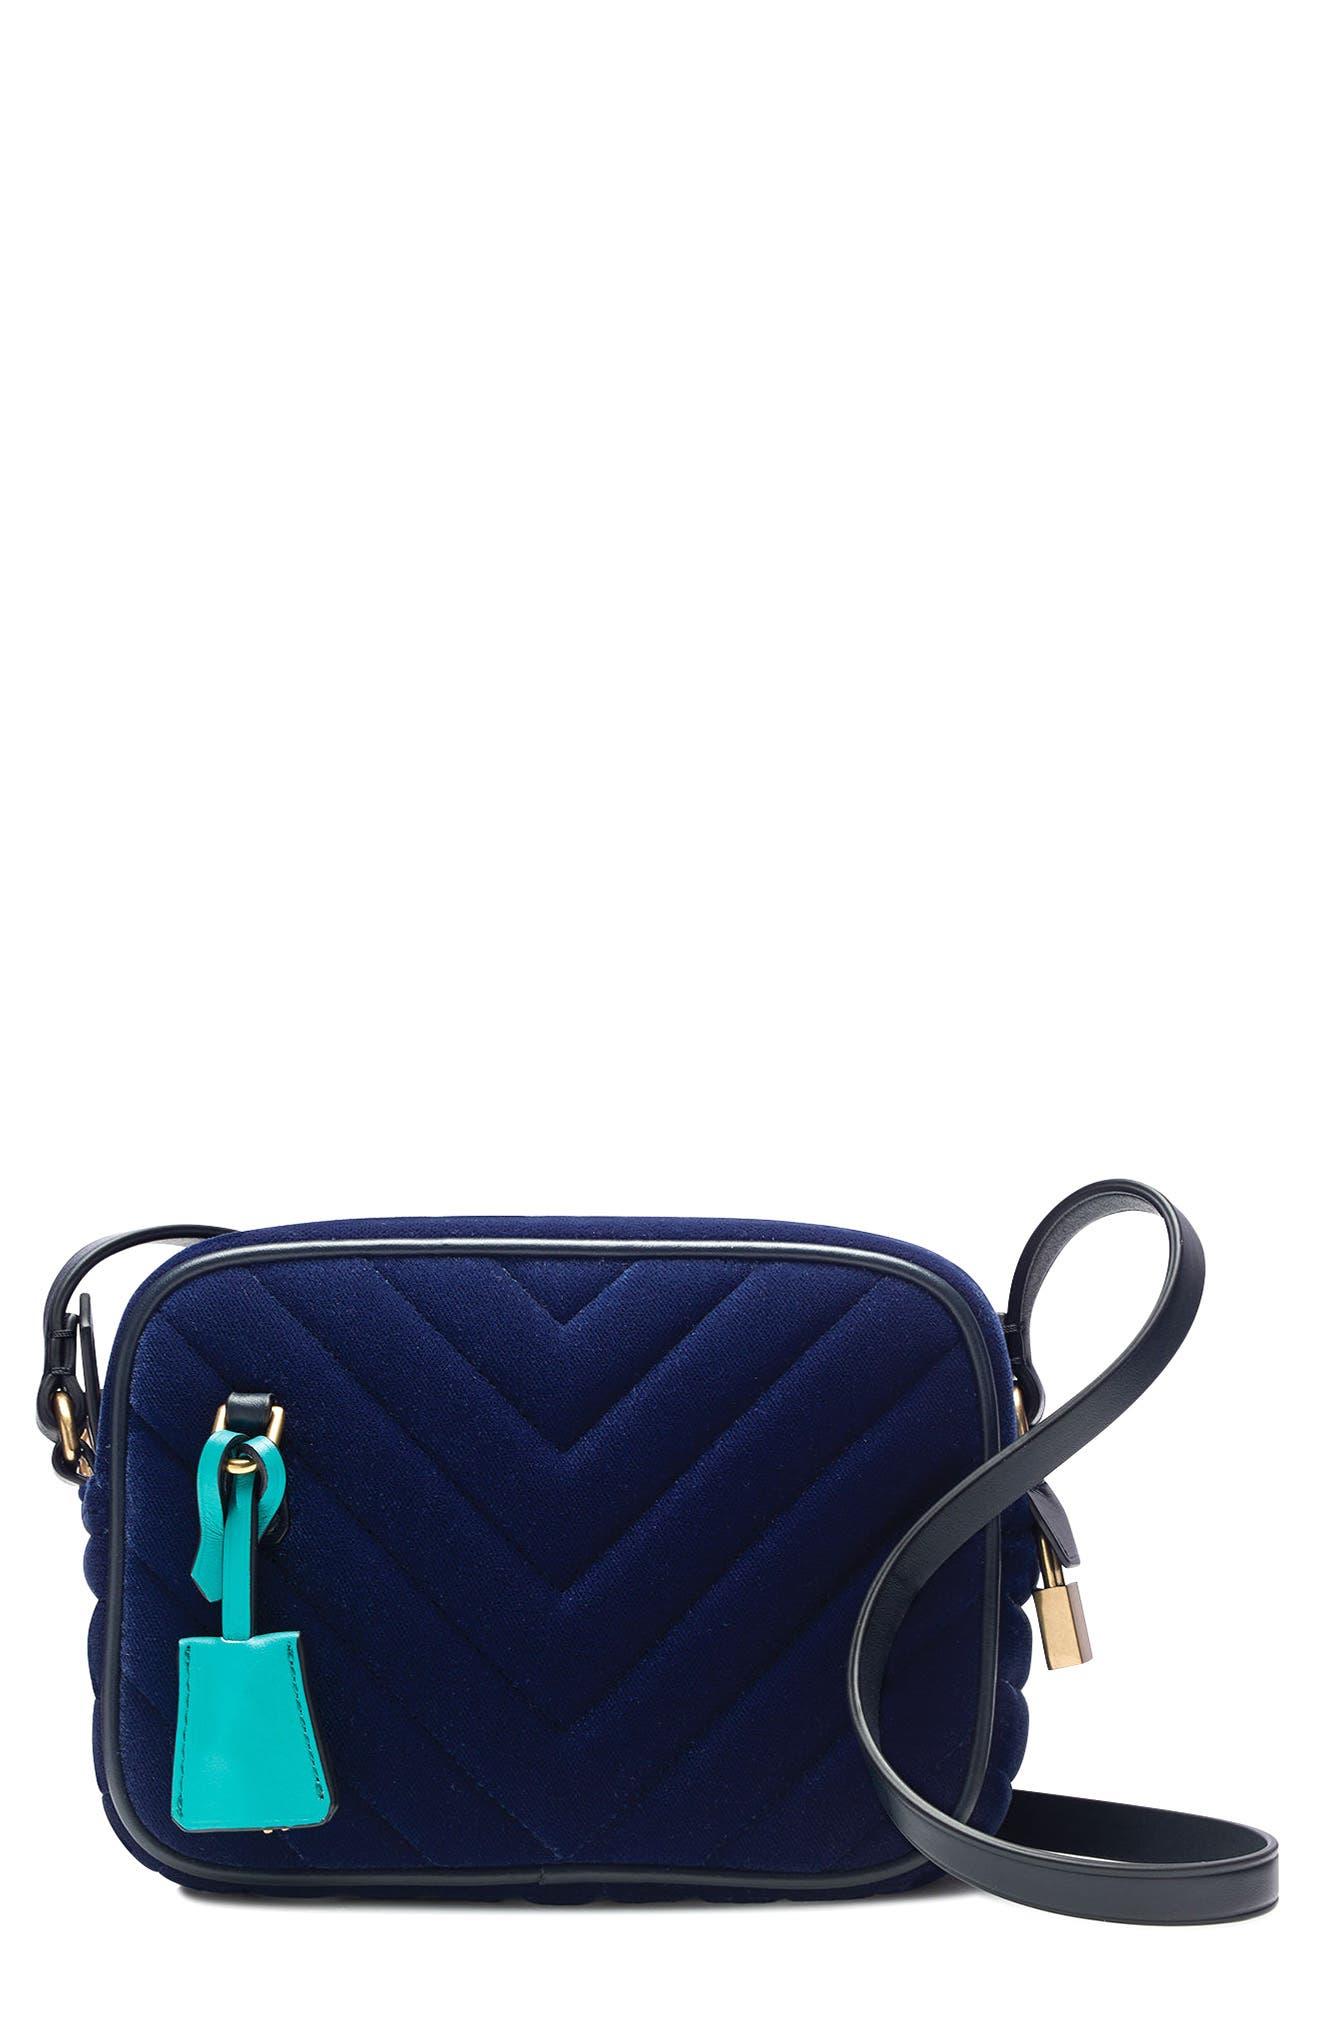 Mini Velvet Signet Bag,                             Main thumbnail 1, color,                             400